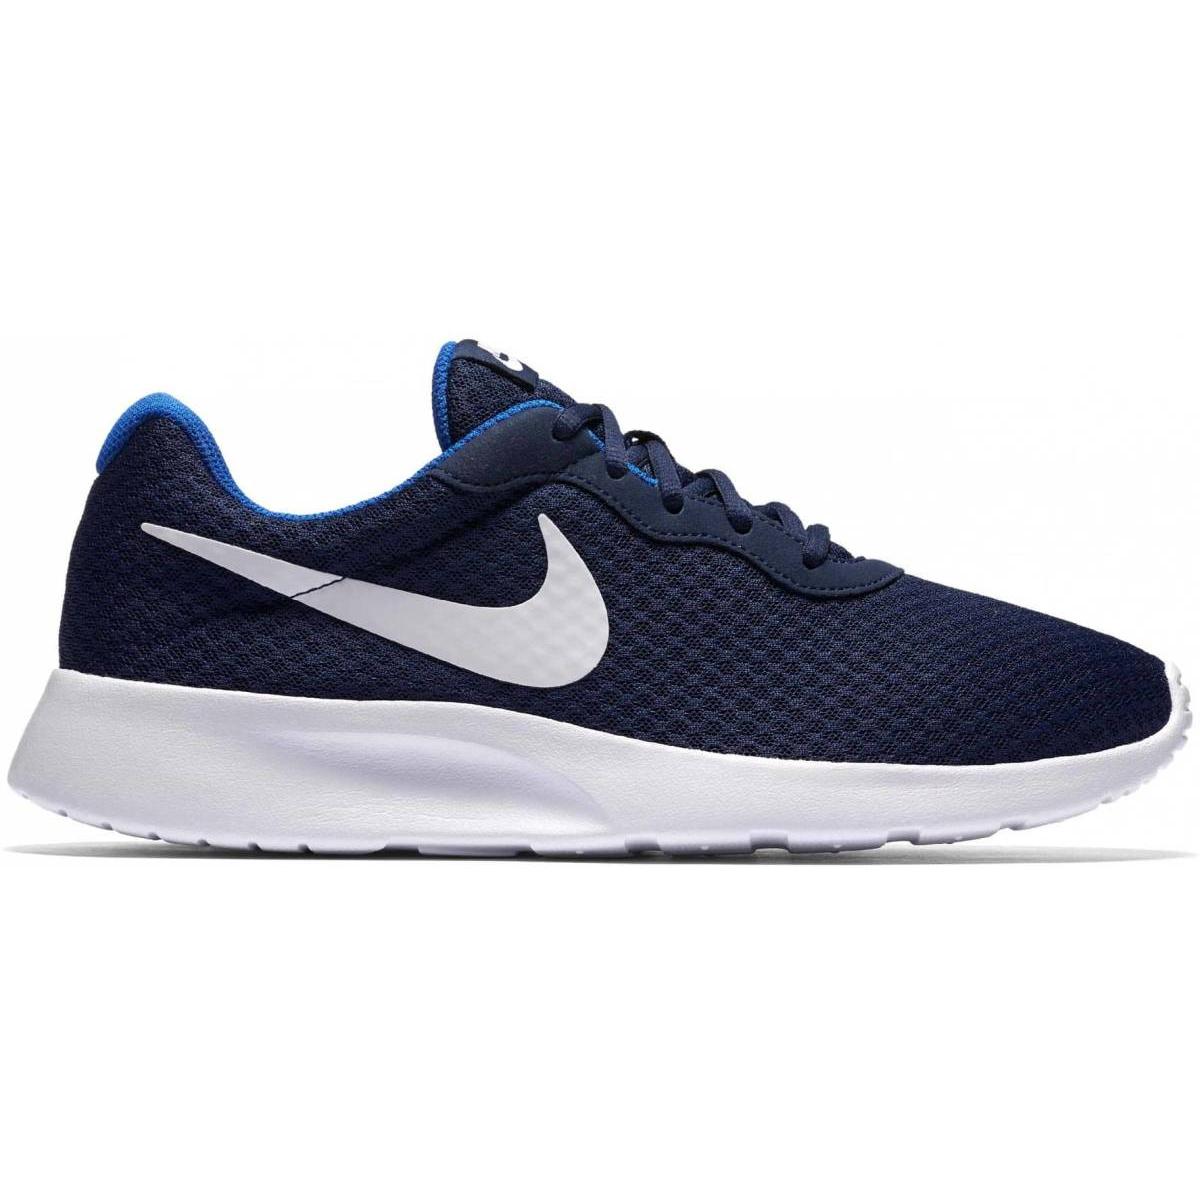 Nike Tanjun Sneaker blau weiß 812654 414